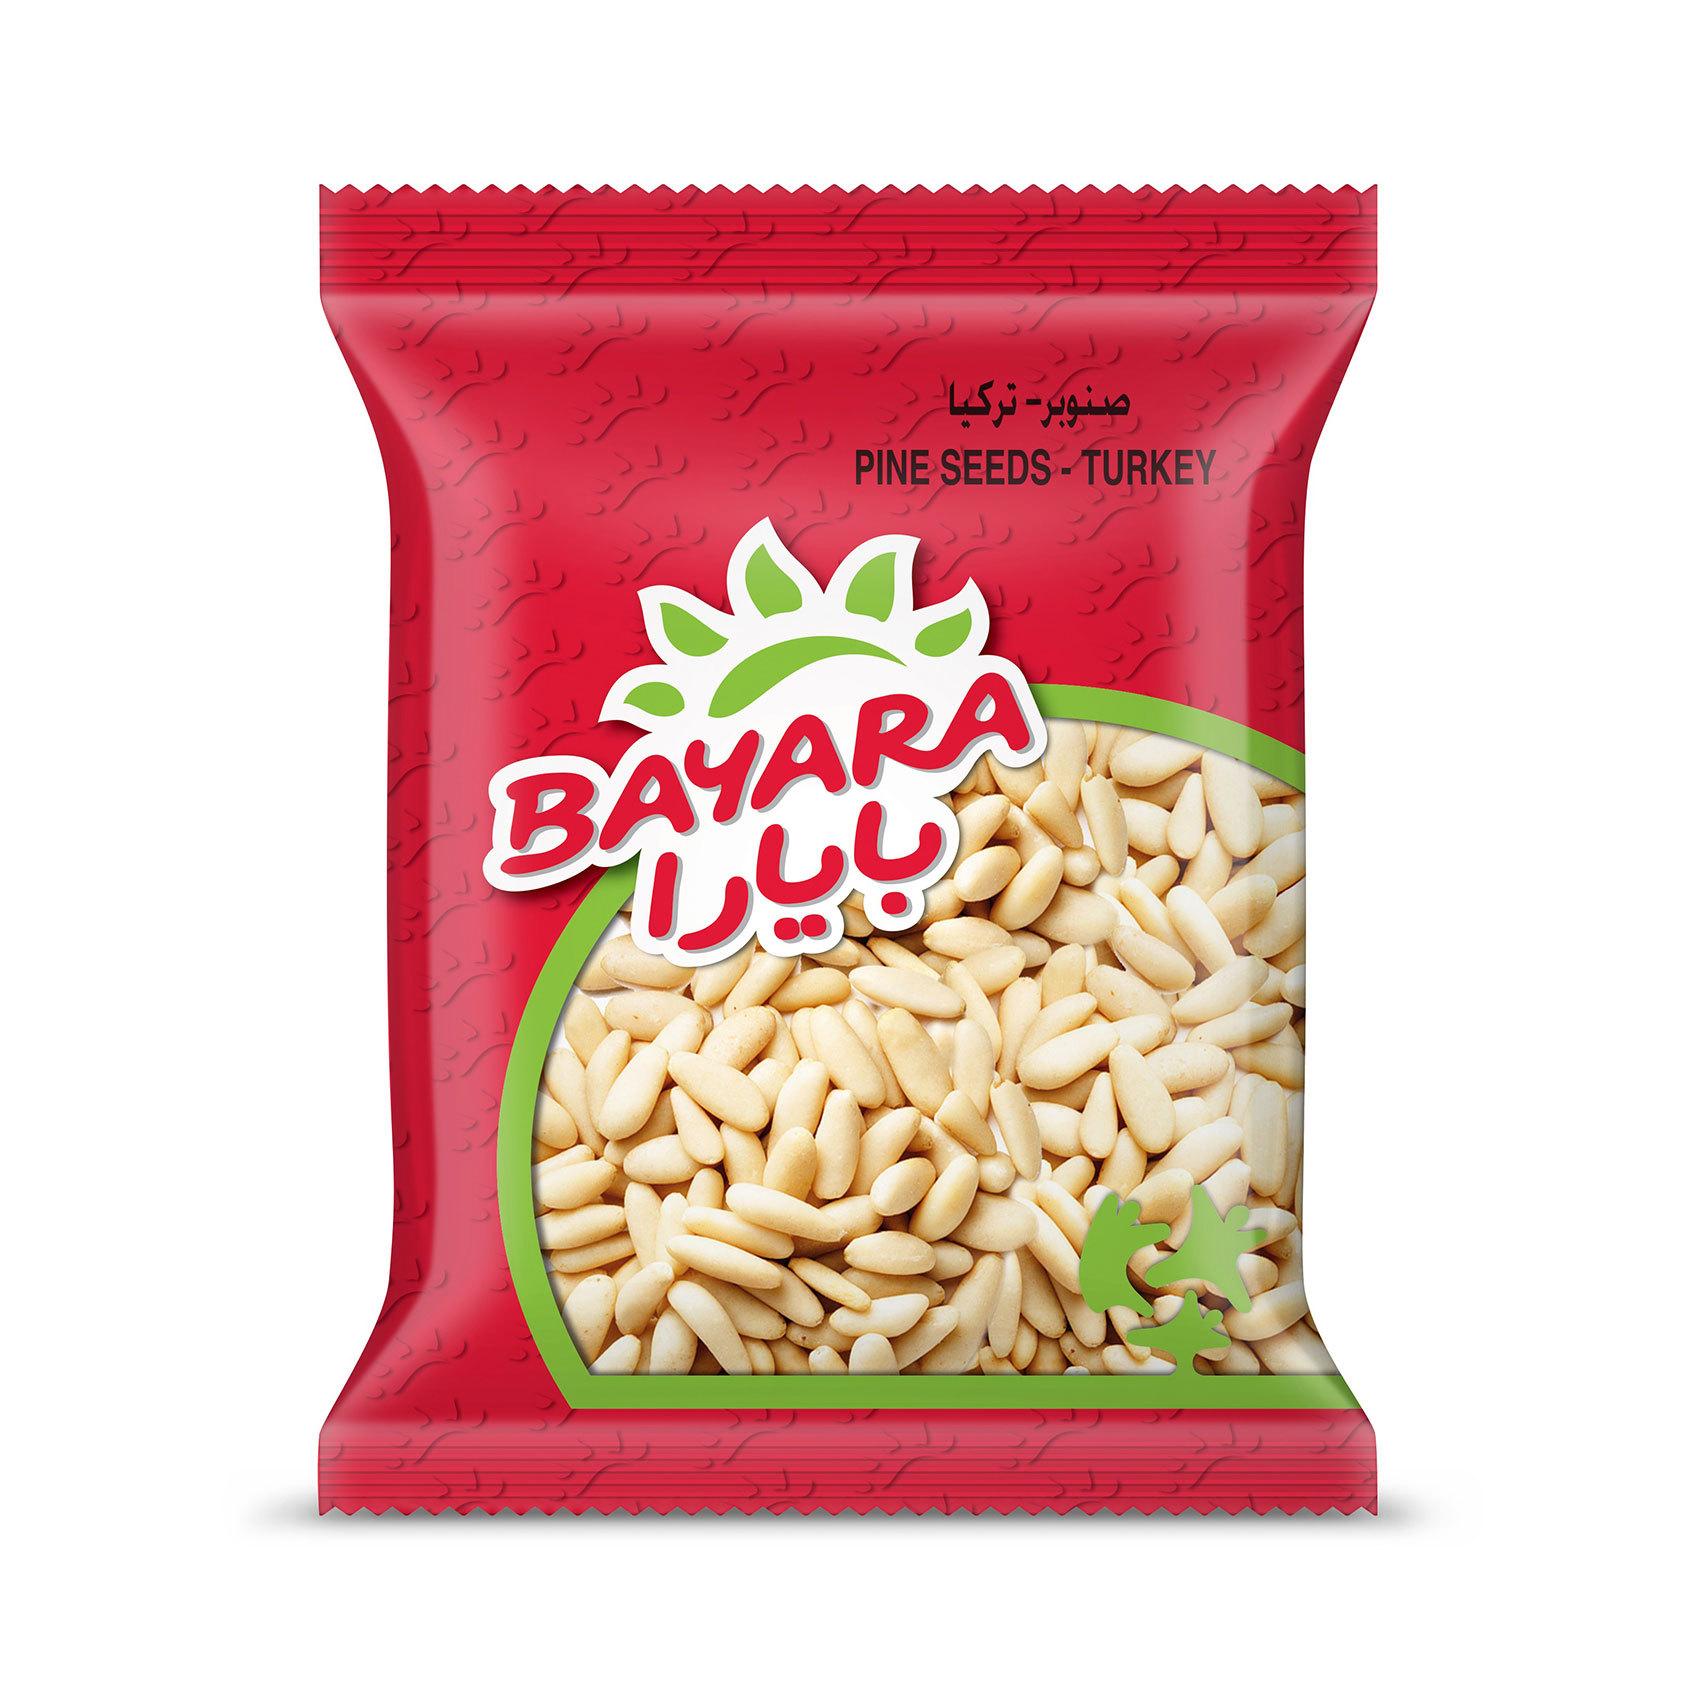 BAYARA PINE SEED TURKEY 100G